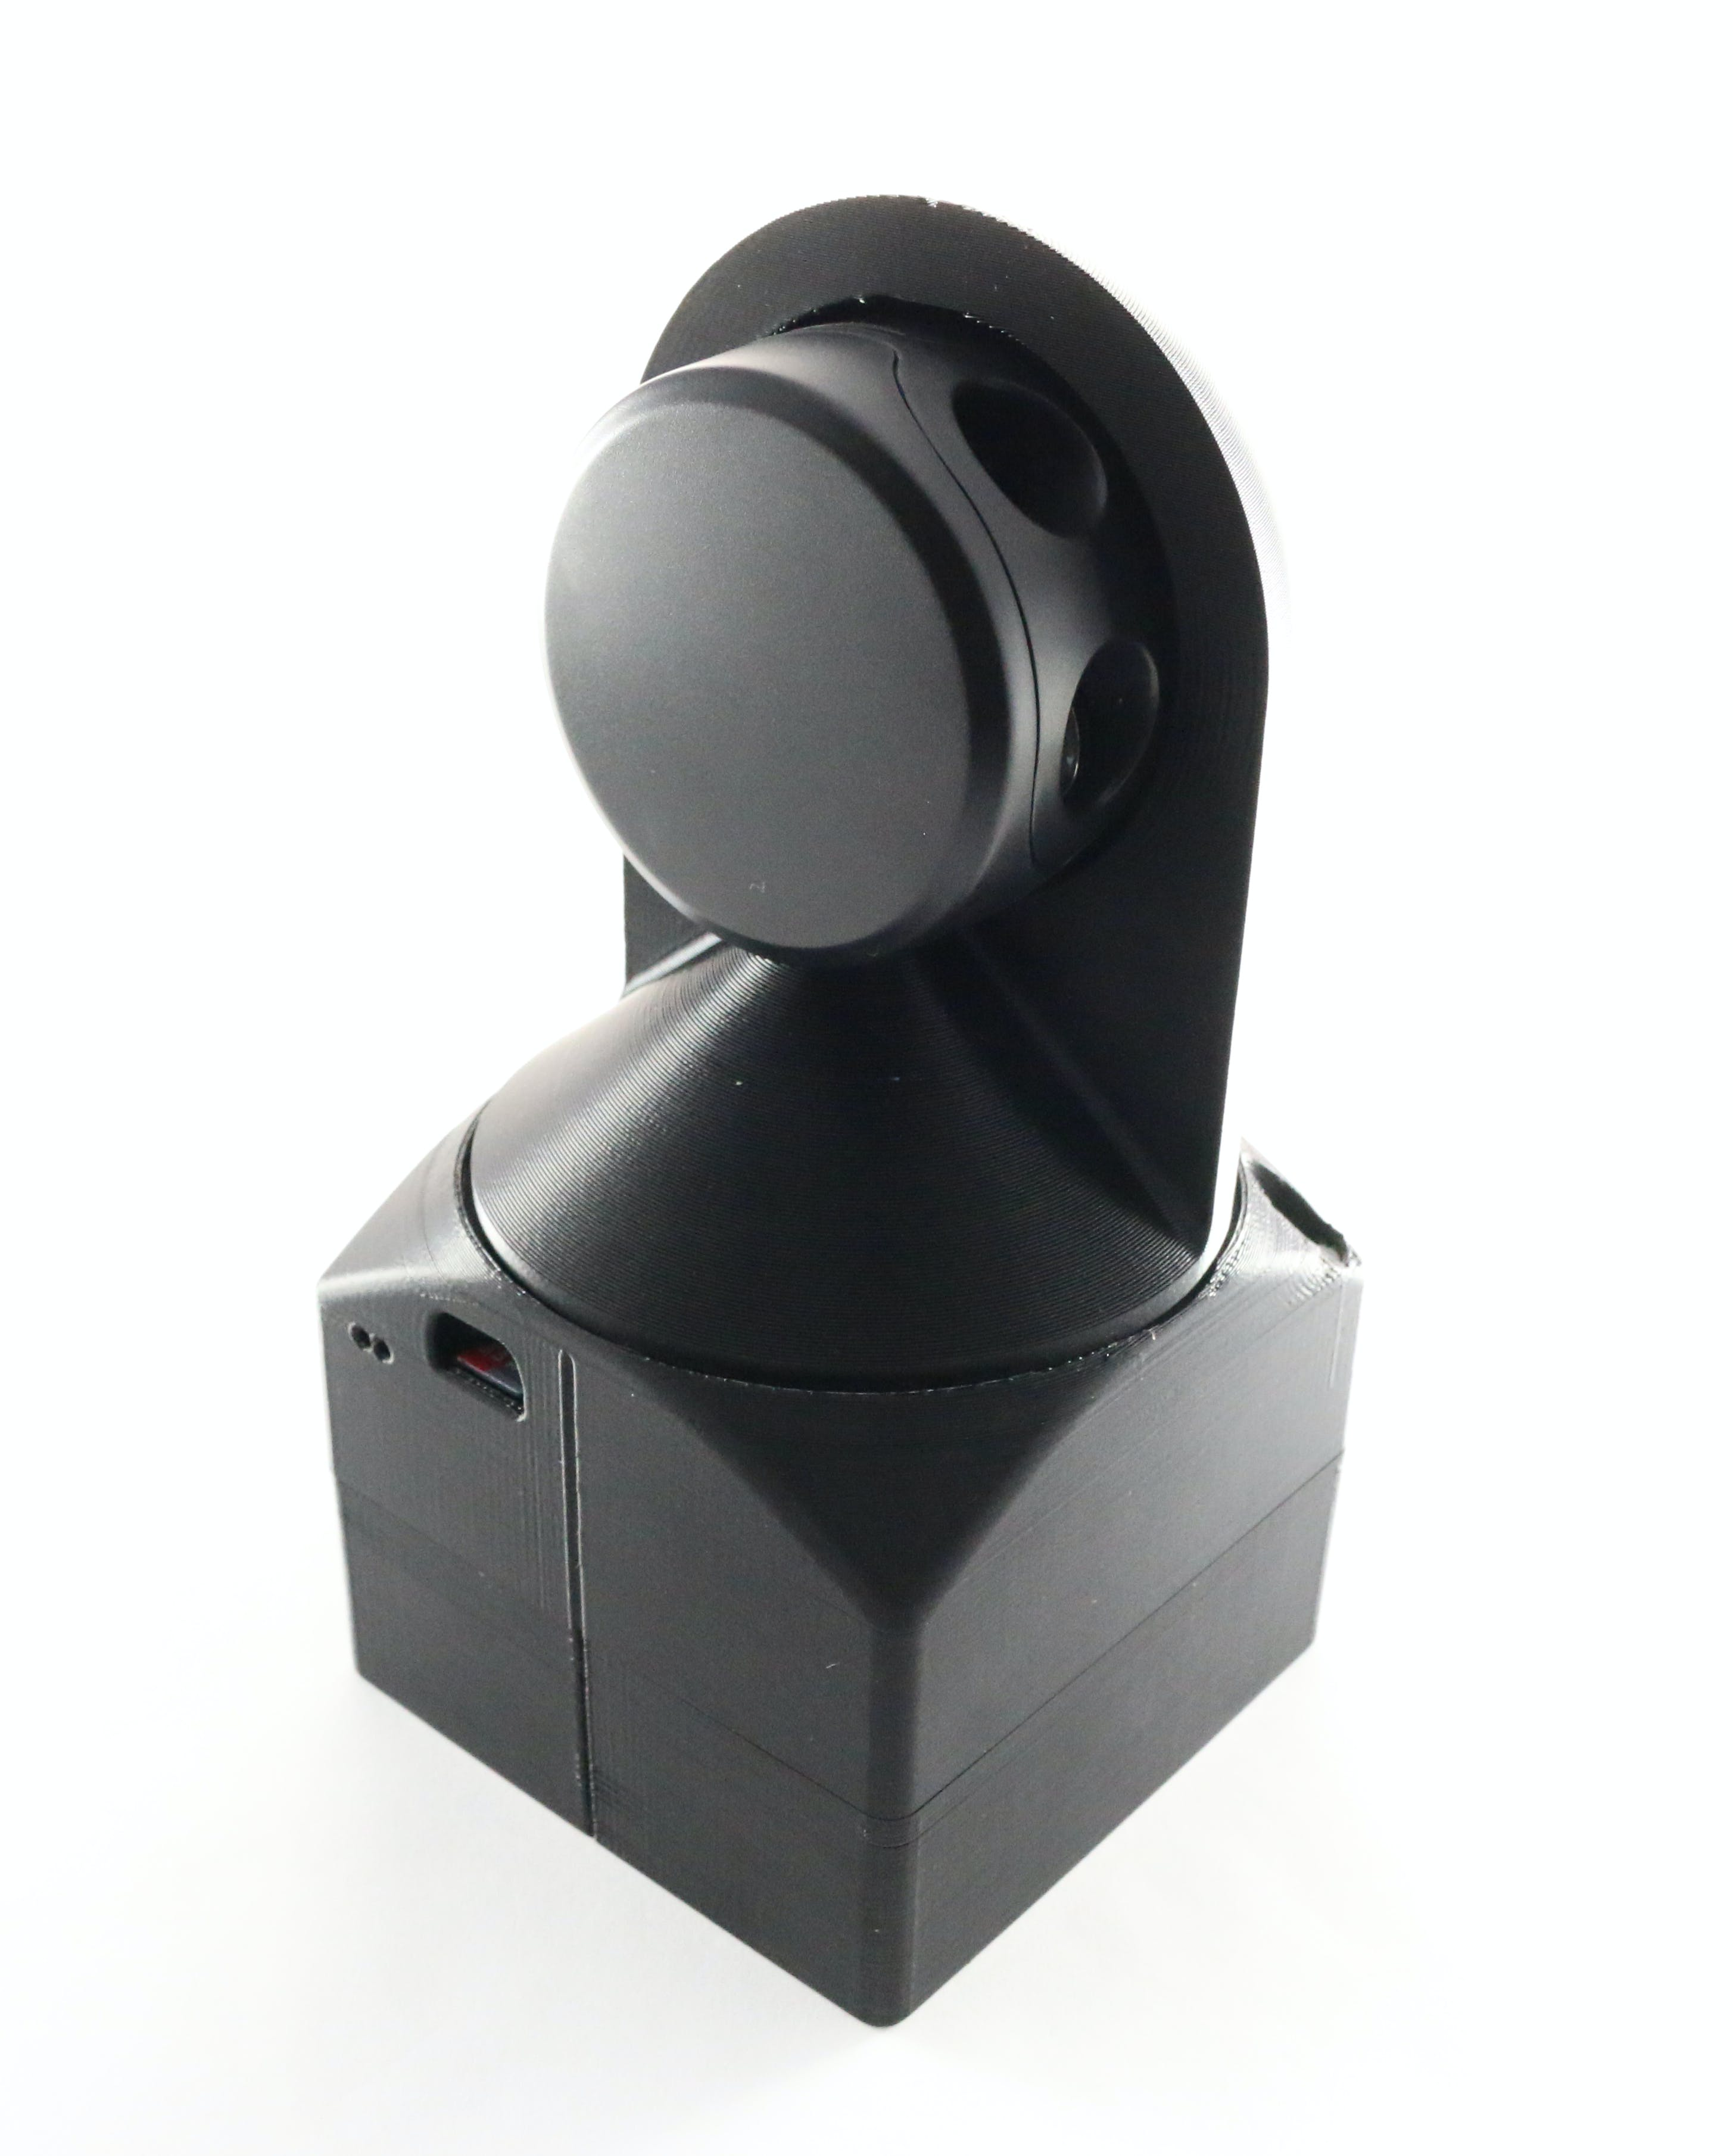 Completed 3D Scanner